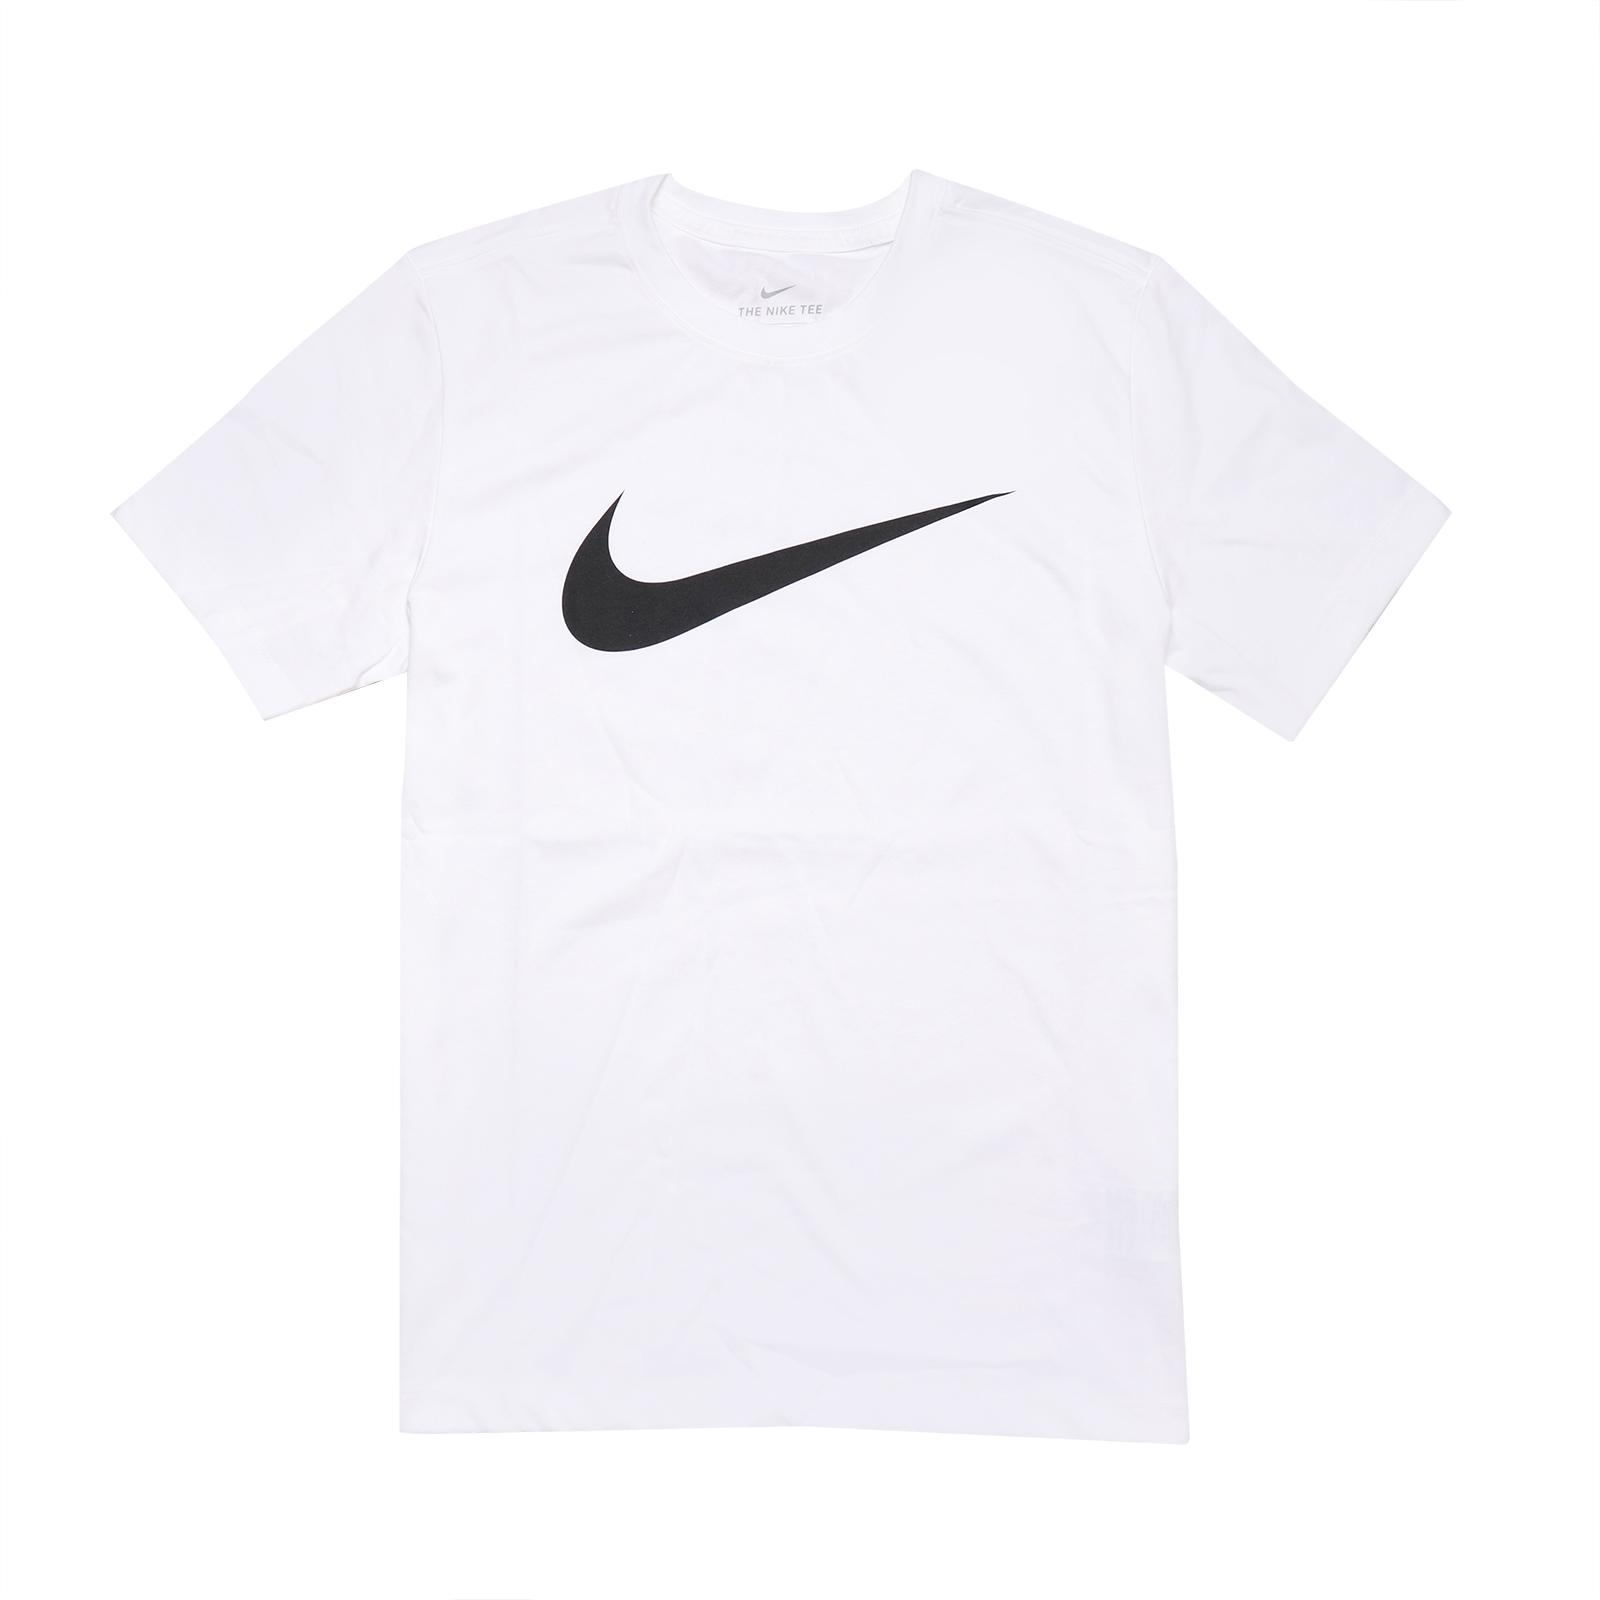 Nike 短袖T恤 NSW Swoosh 白 黑 男款 短T 運動休閒【ACS】 DC5095-100